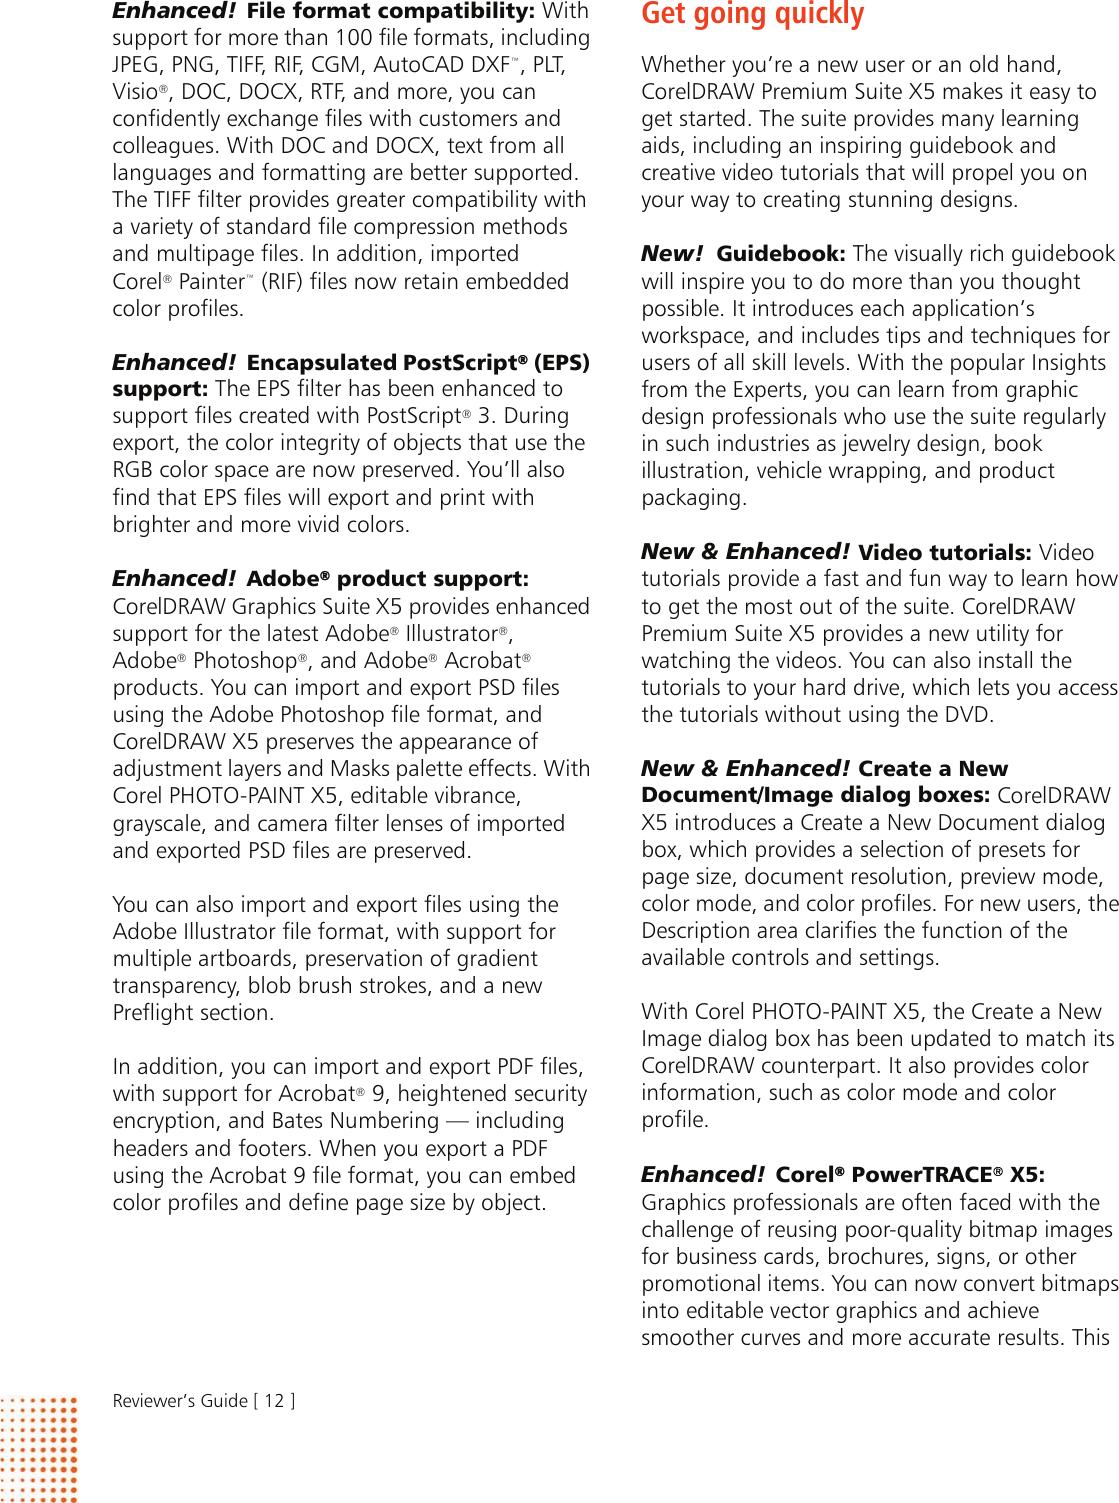 Corel CorelDRAW Premium Suite X5 Reviewer's Guide Draw CDPSX5 Rg En